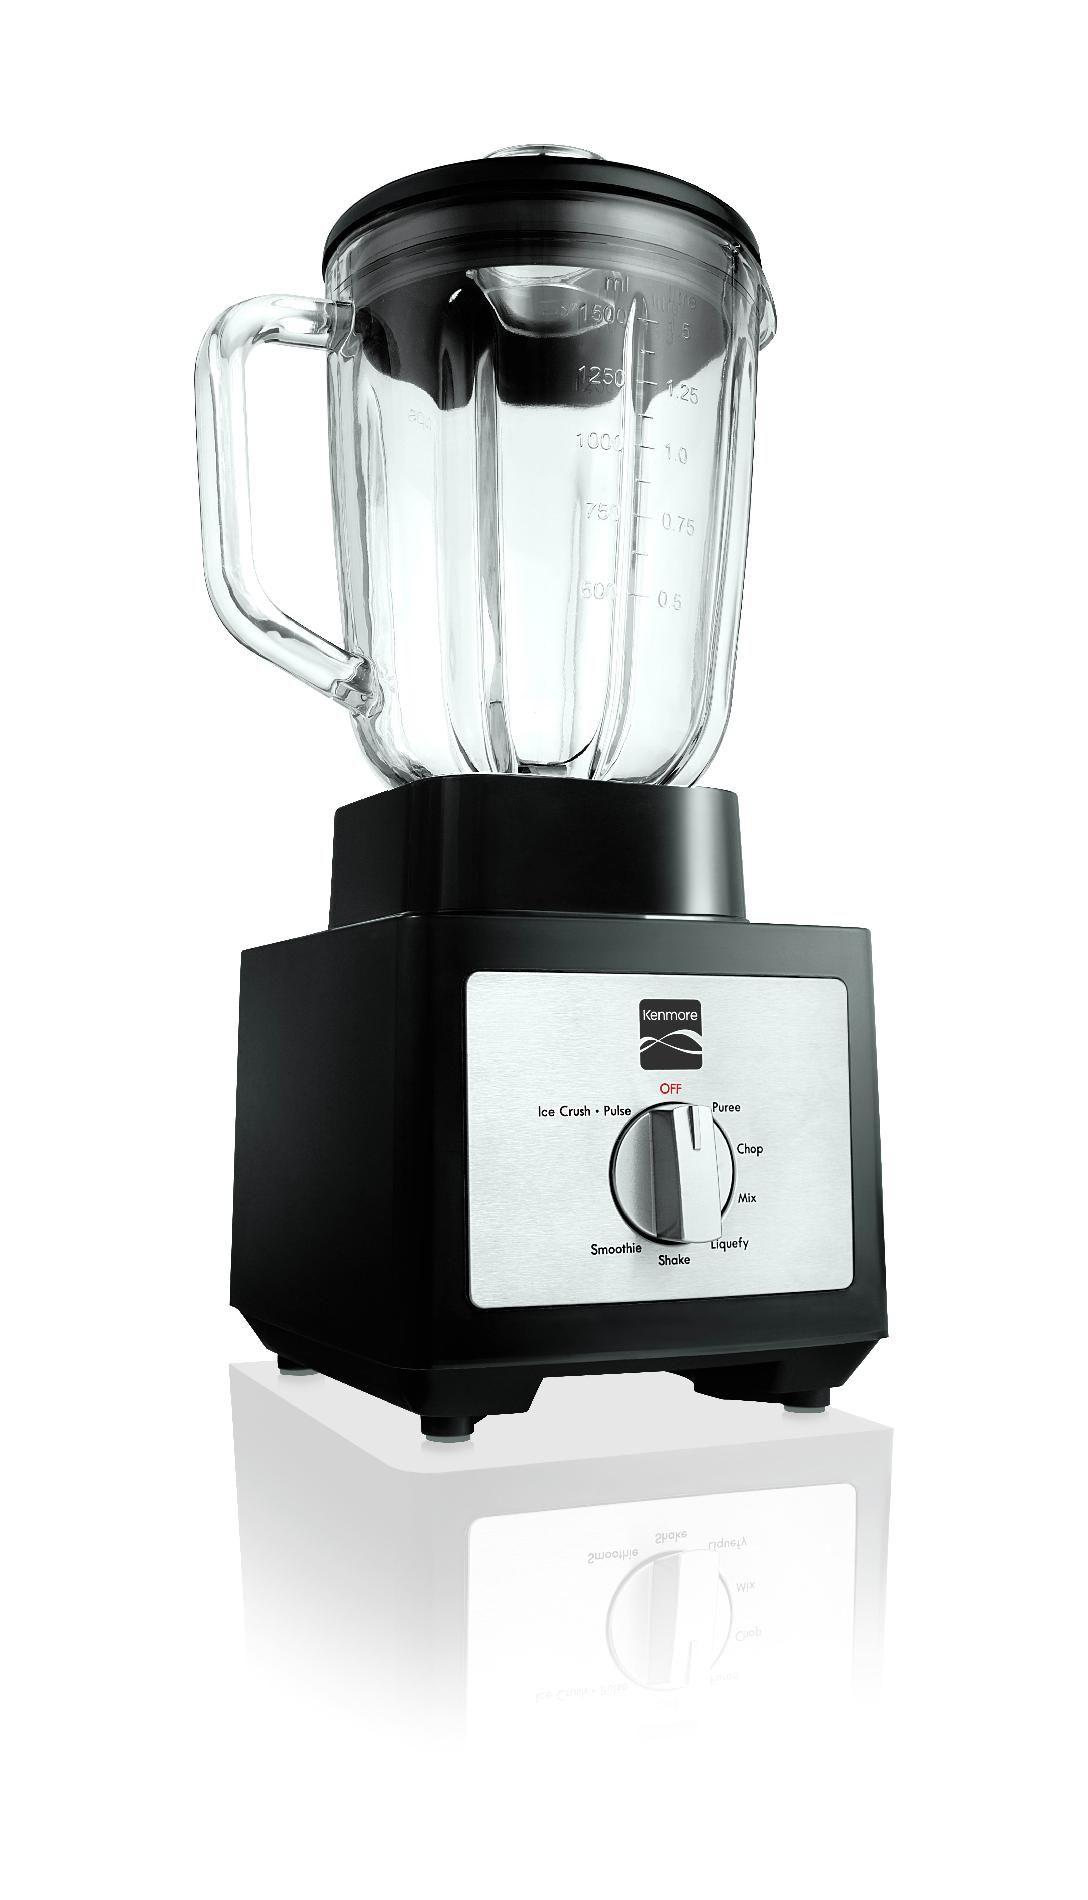 Kenmore Blender, Black